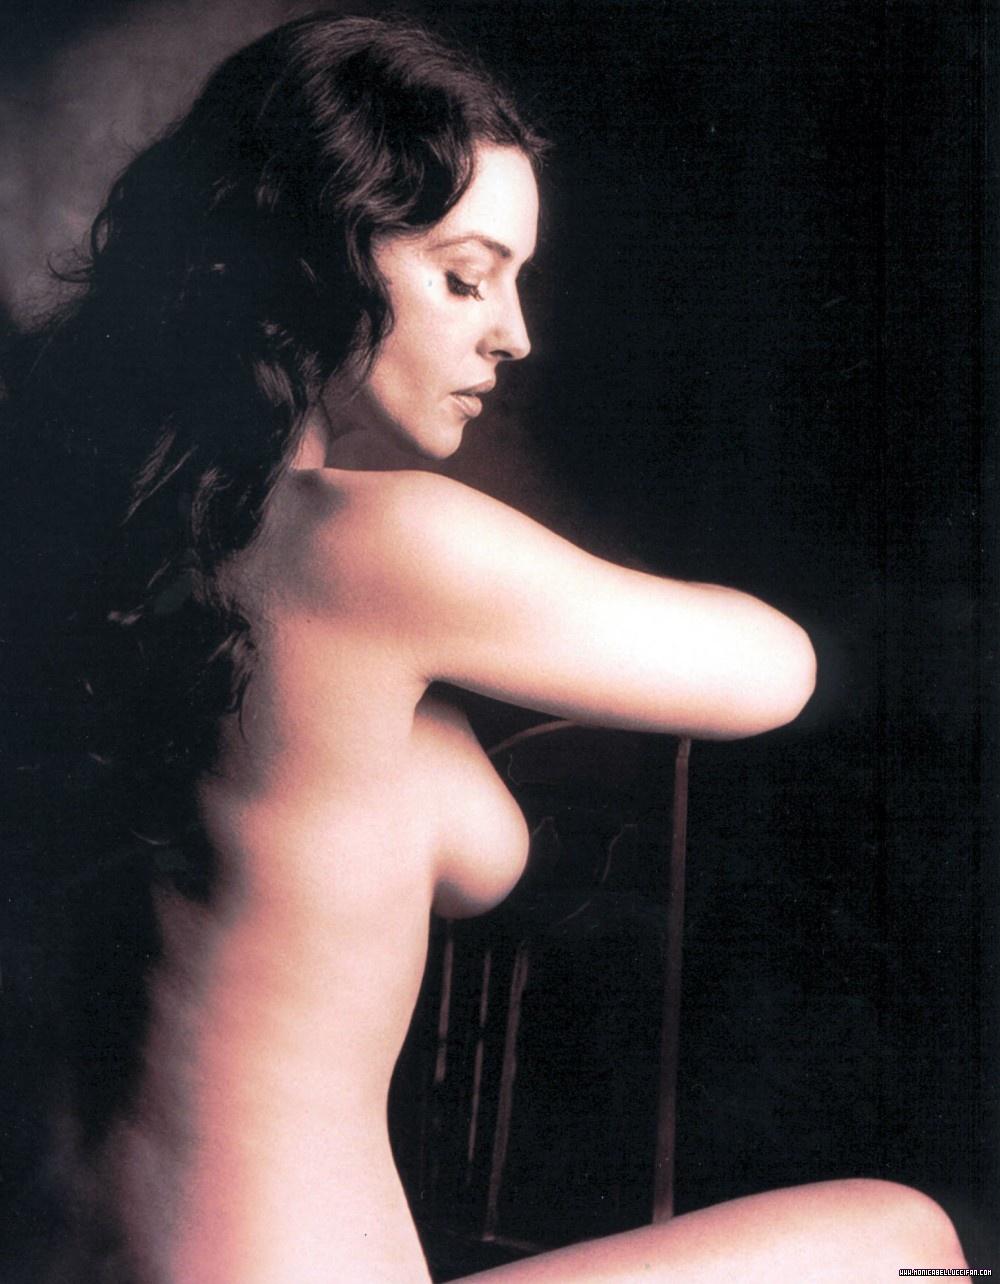 Филем онлаен отрывок эротика моники белуччи 24 фотография